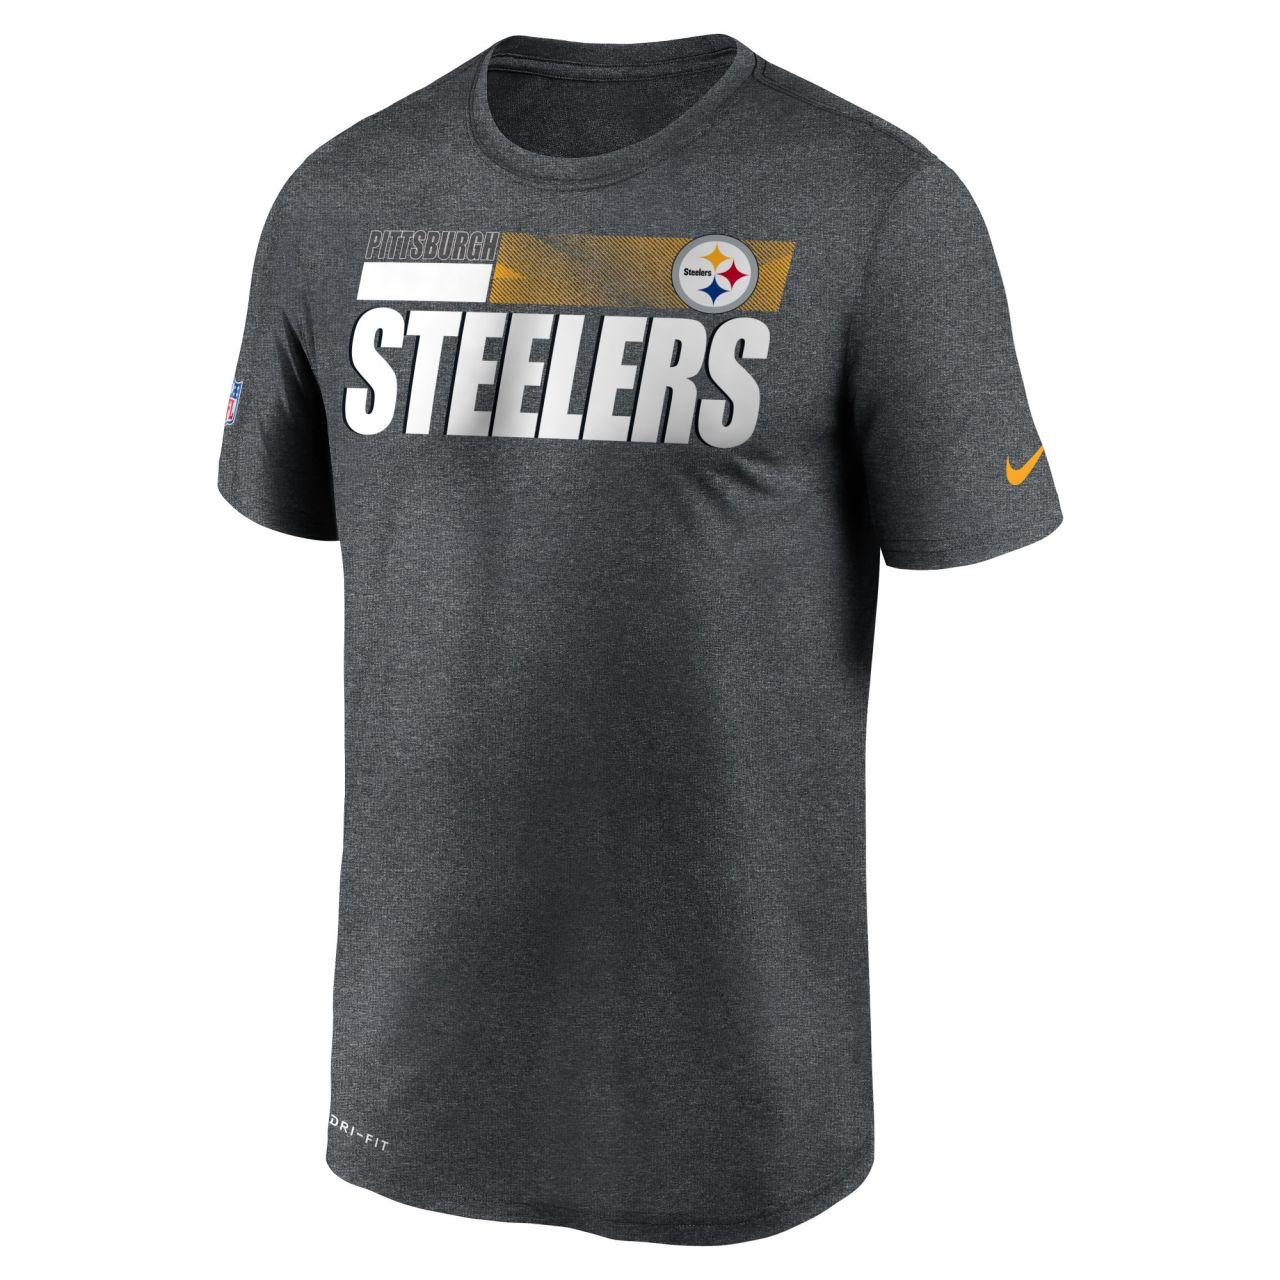 amfoo - Nike Dri-FIT Legend Shirt - SIDELINE Pittsburgh Steelers